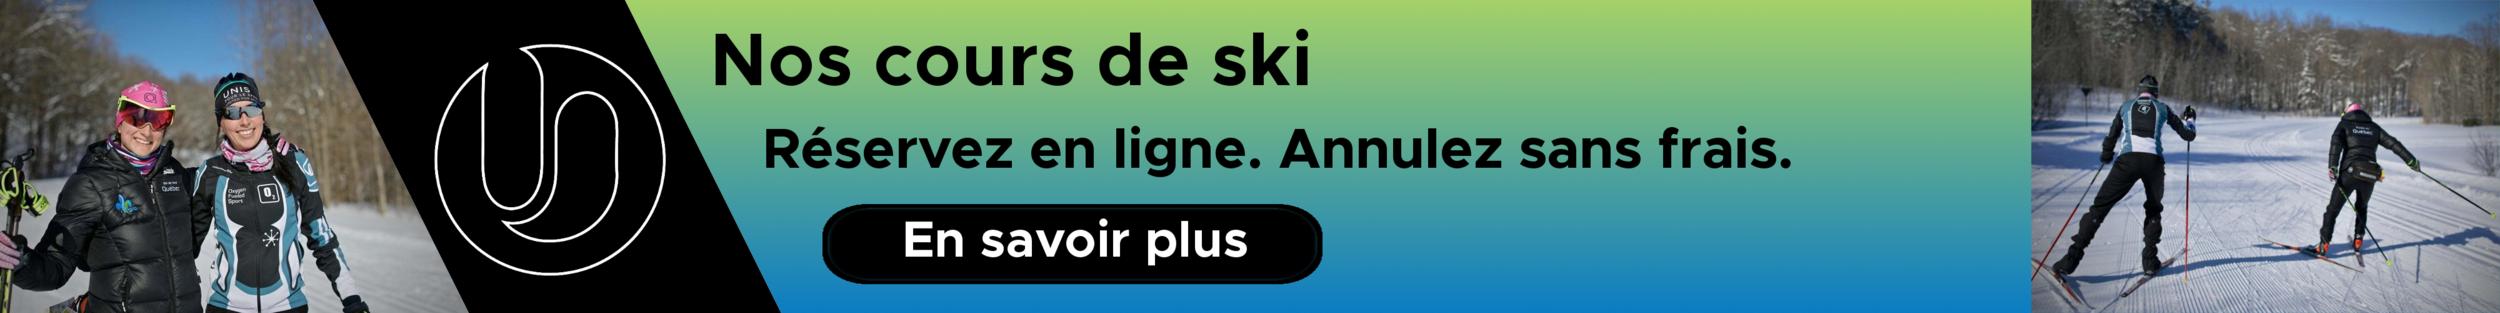 Banner_Ski_lessonsx8-m03.png